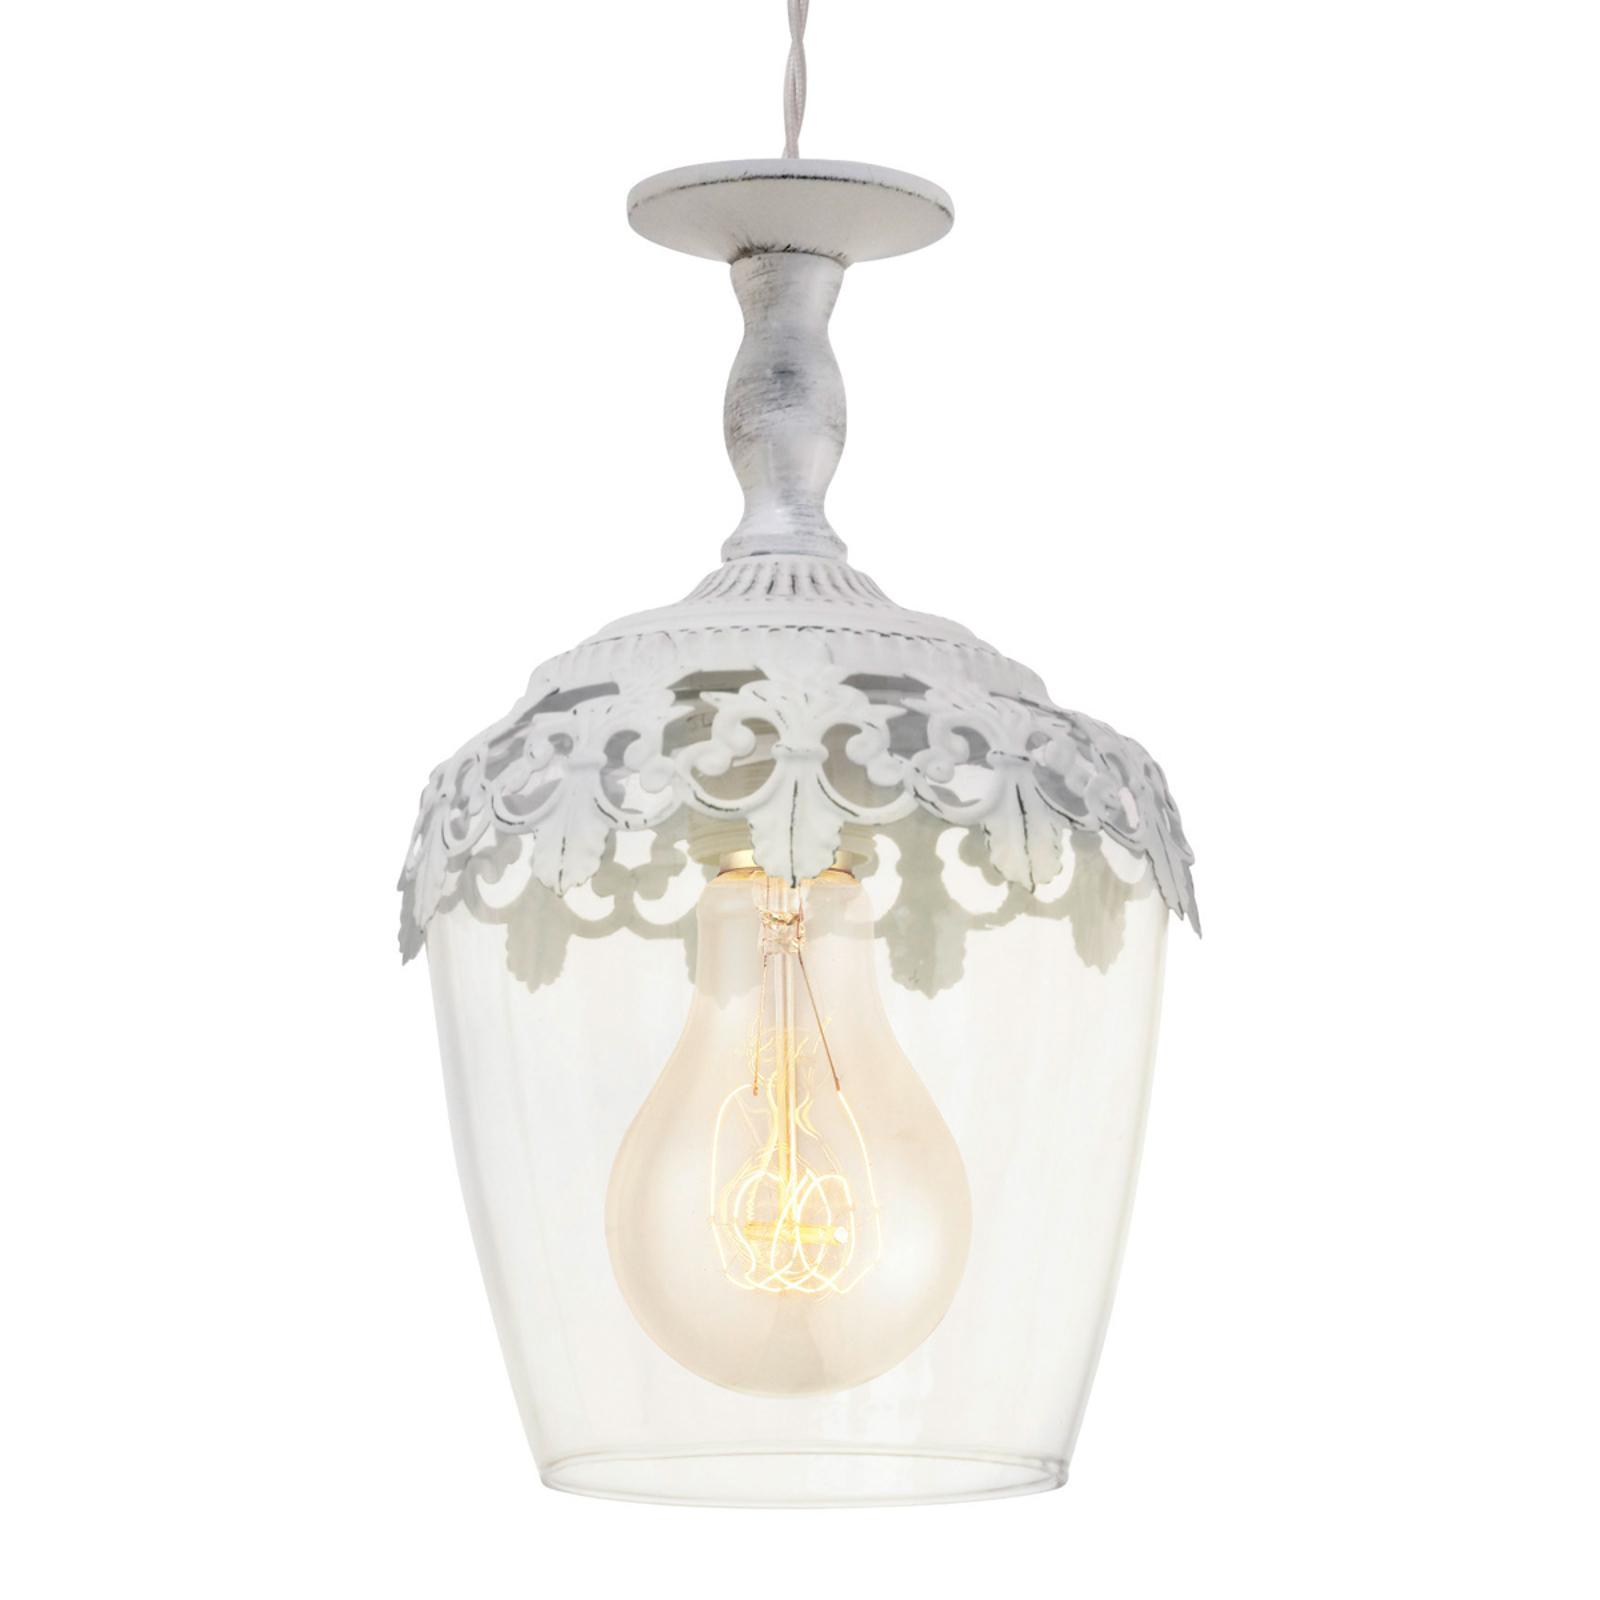 Florinia Pendant Lamp, Patinated White_3031594_1